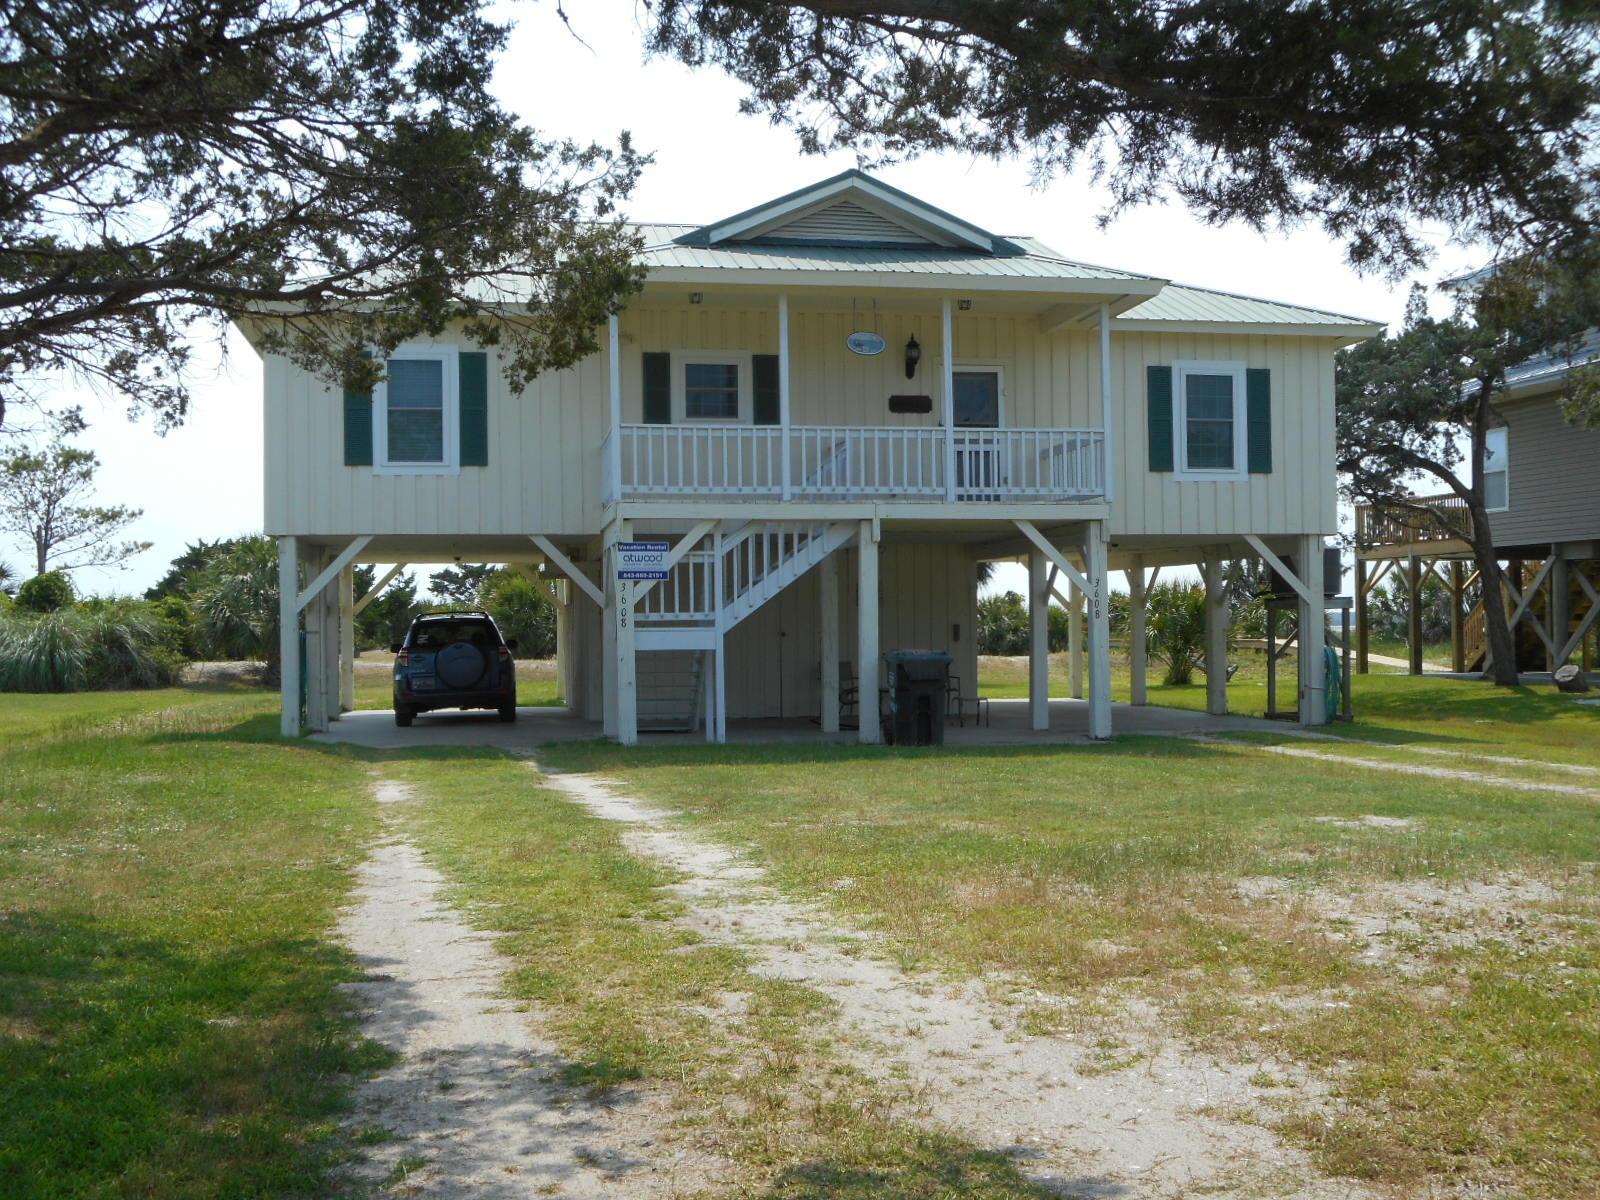 Beachfront Homes For Sale - 3608 Yacht Club, Edisto Beach, SC - 4